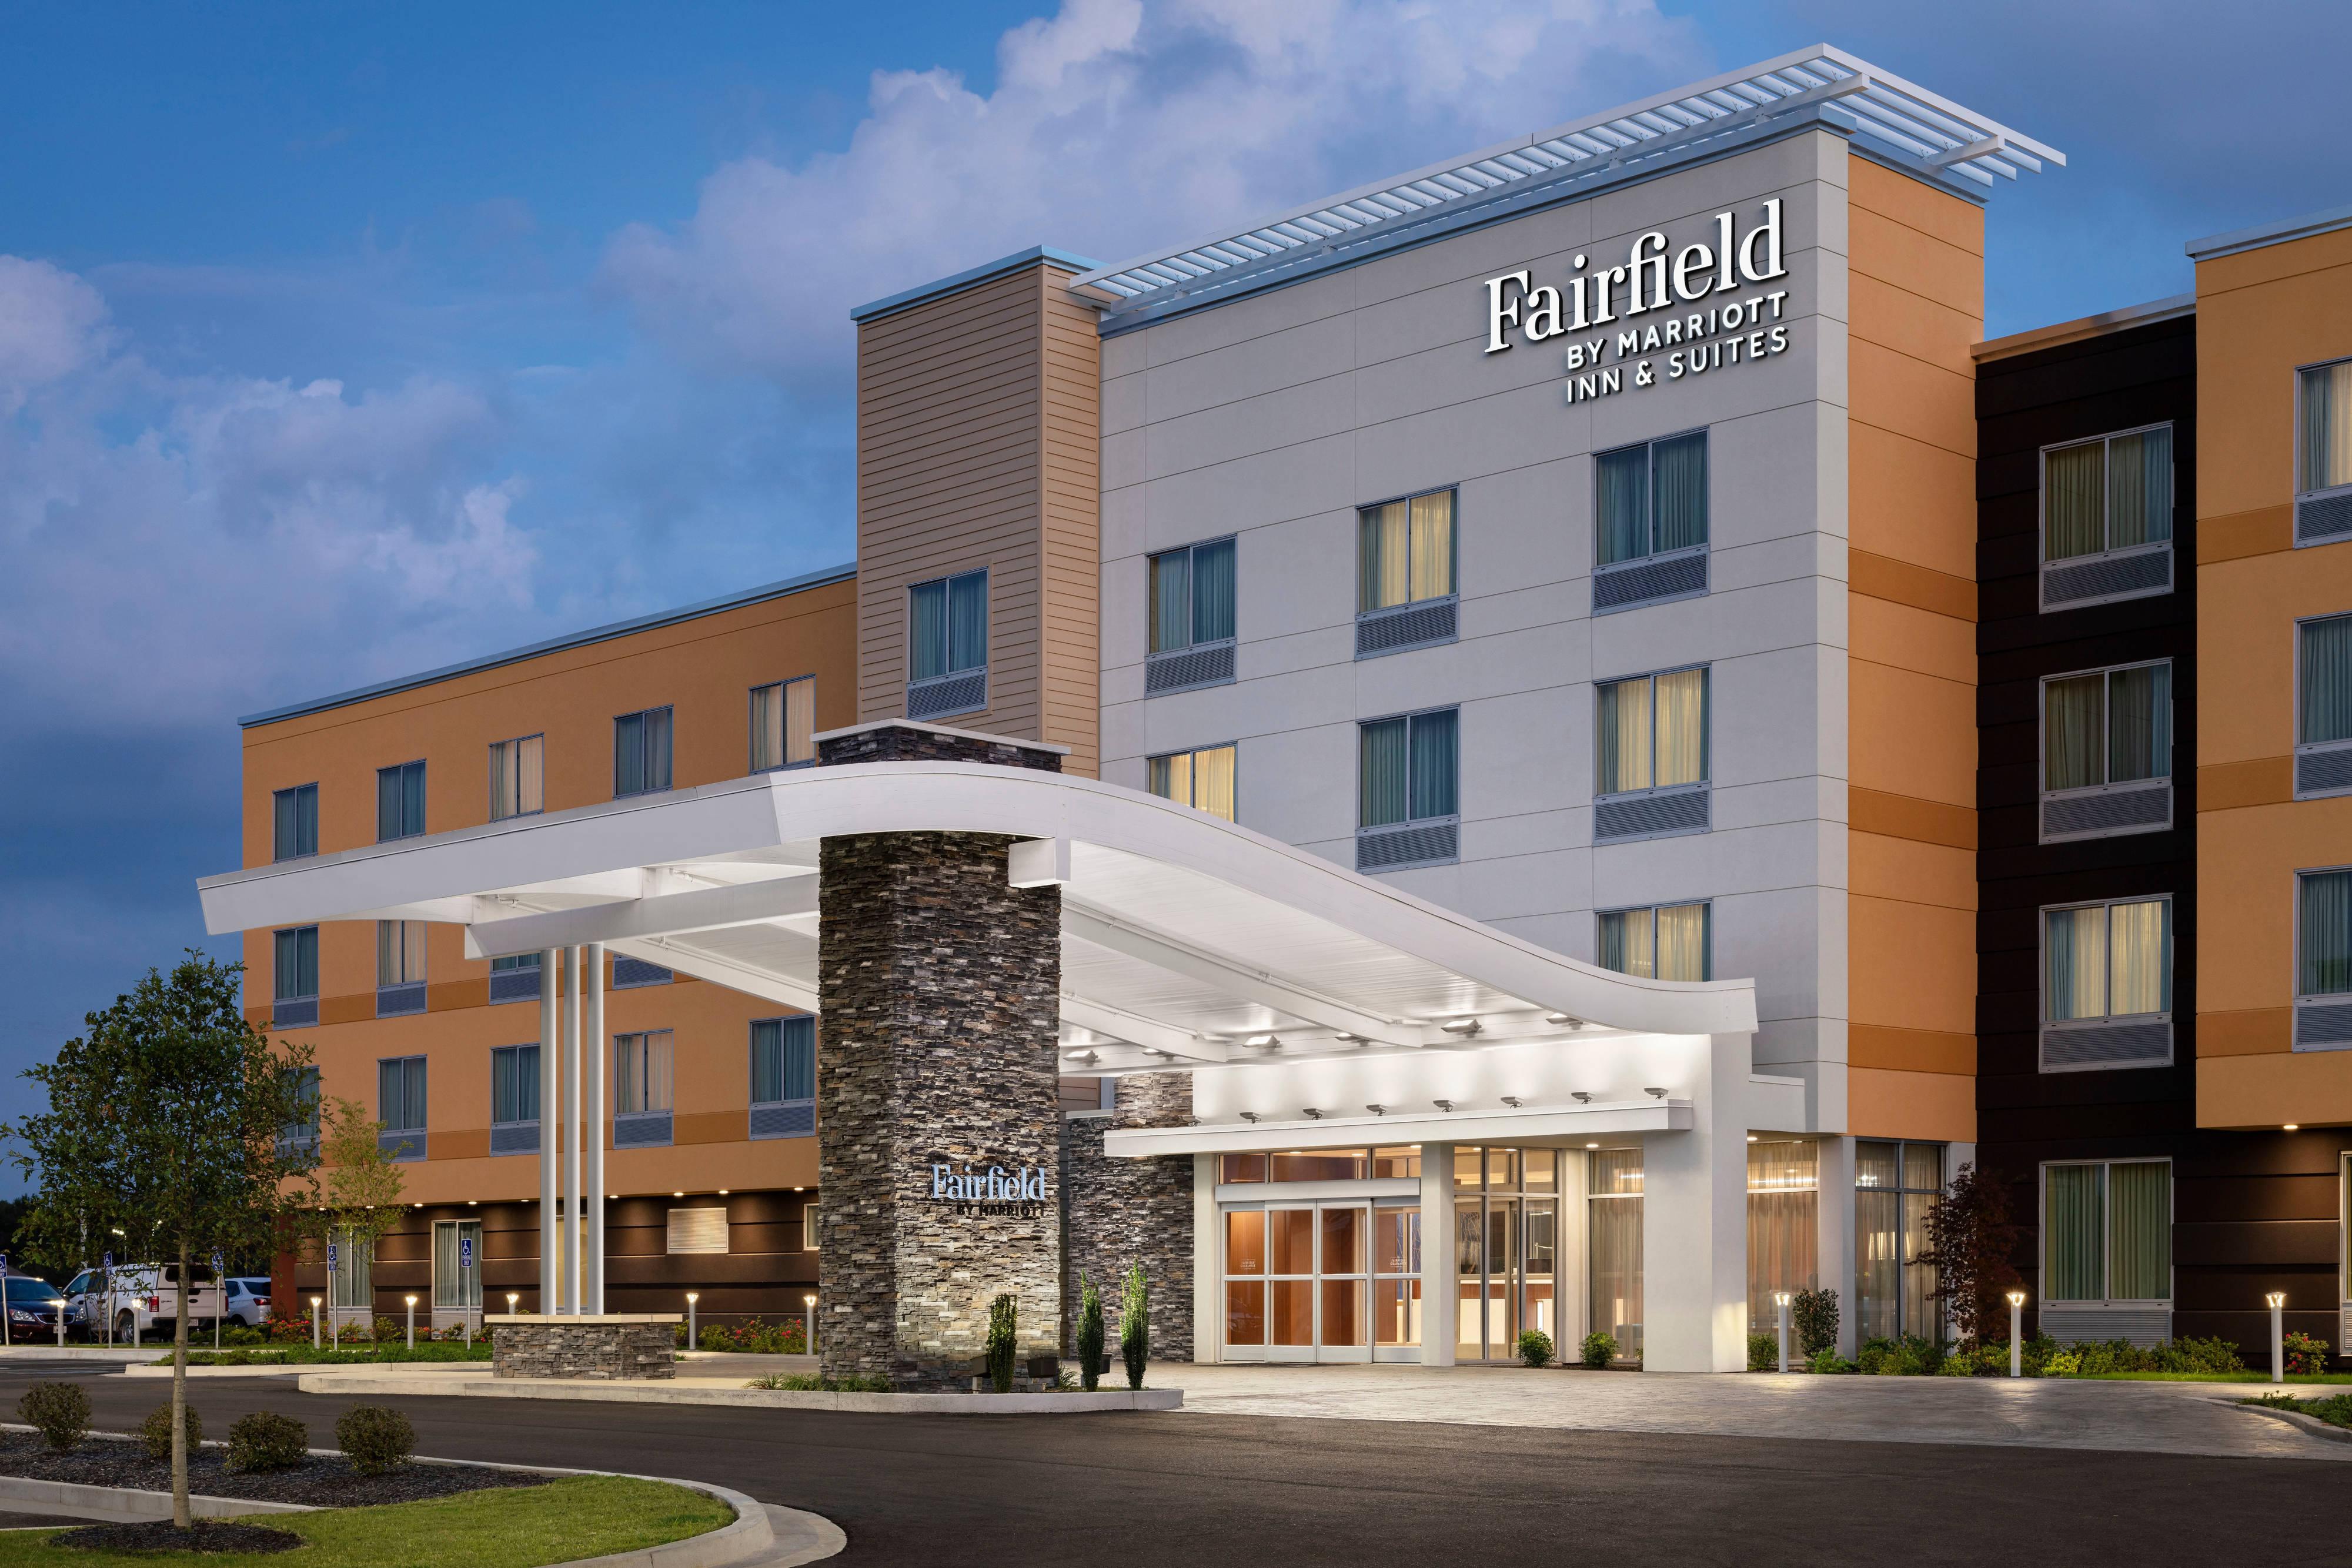 Fairfield Inn &sts By Marriott Cleveland